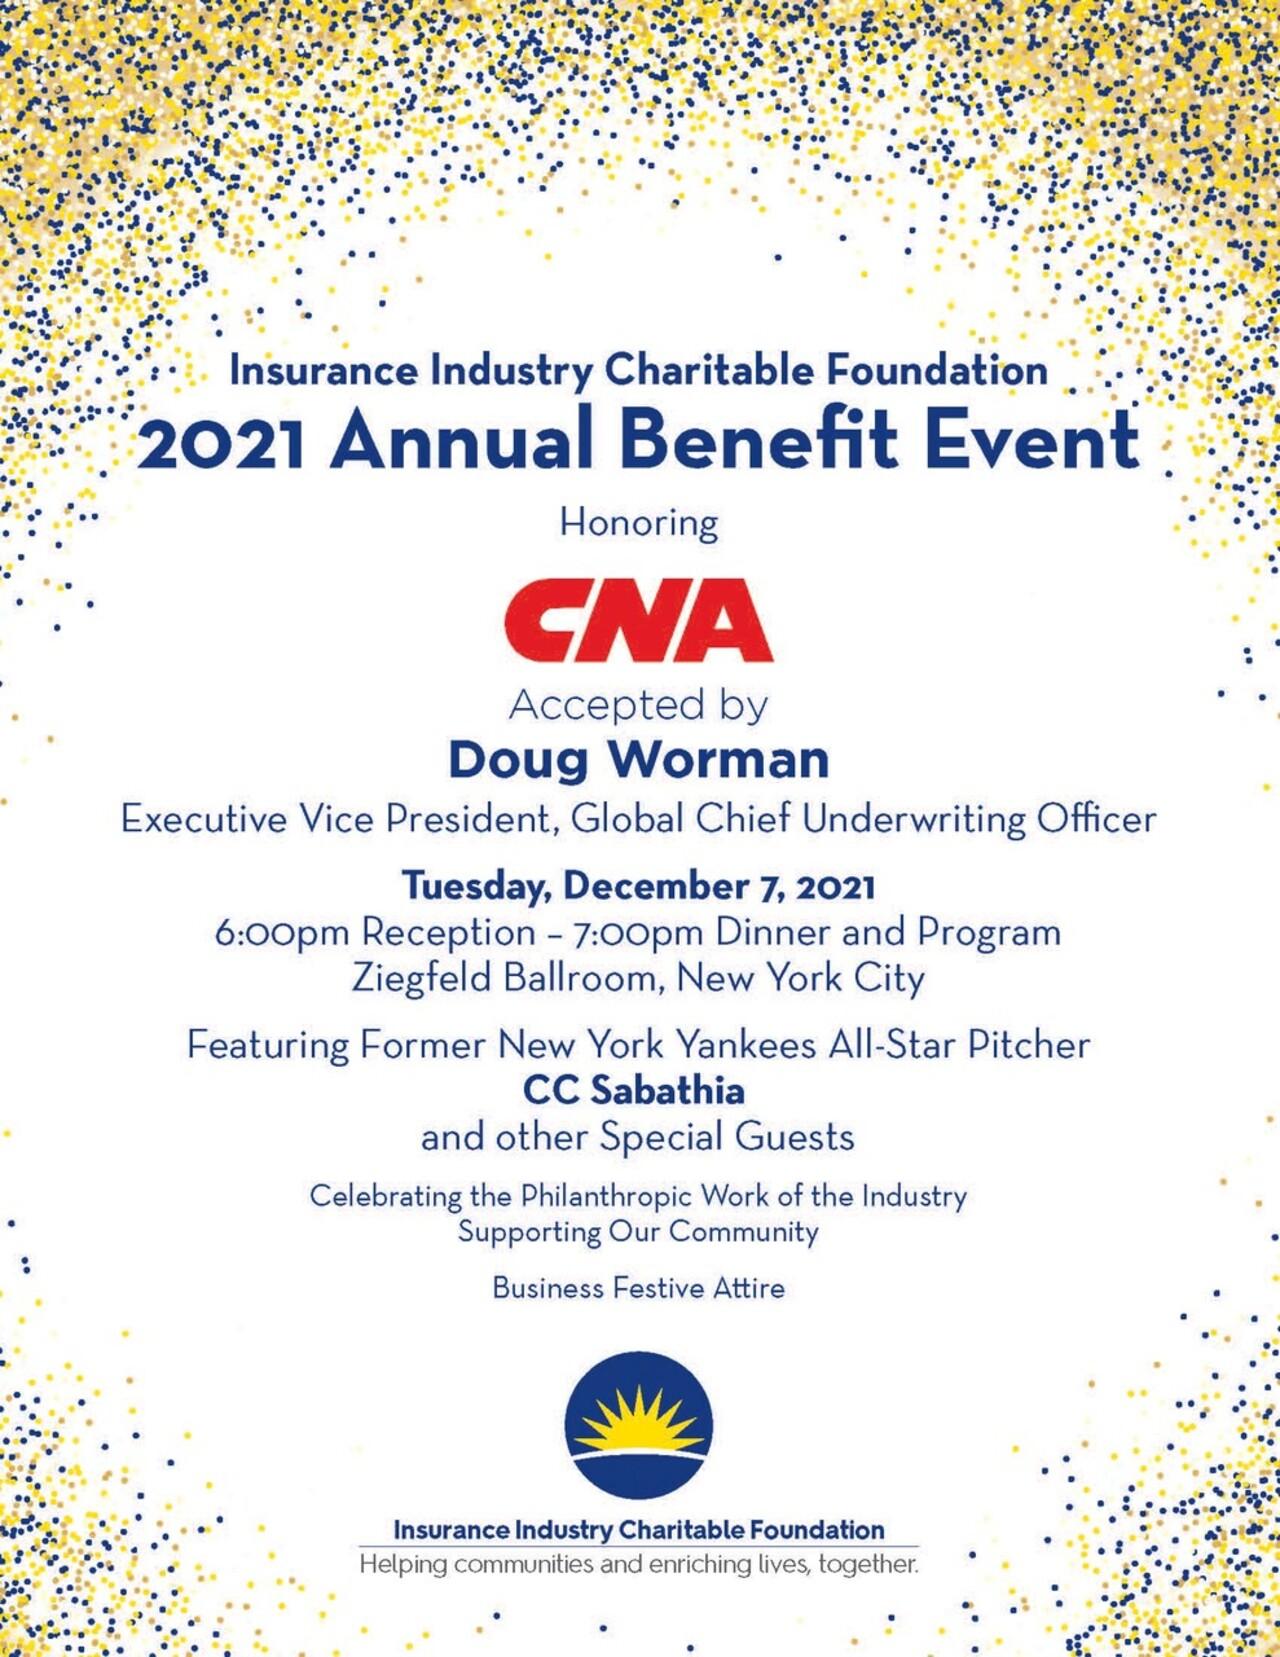 IICF Northeast Annual Benefit 2021